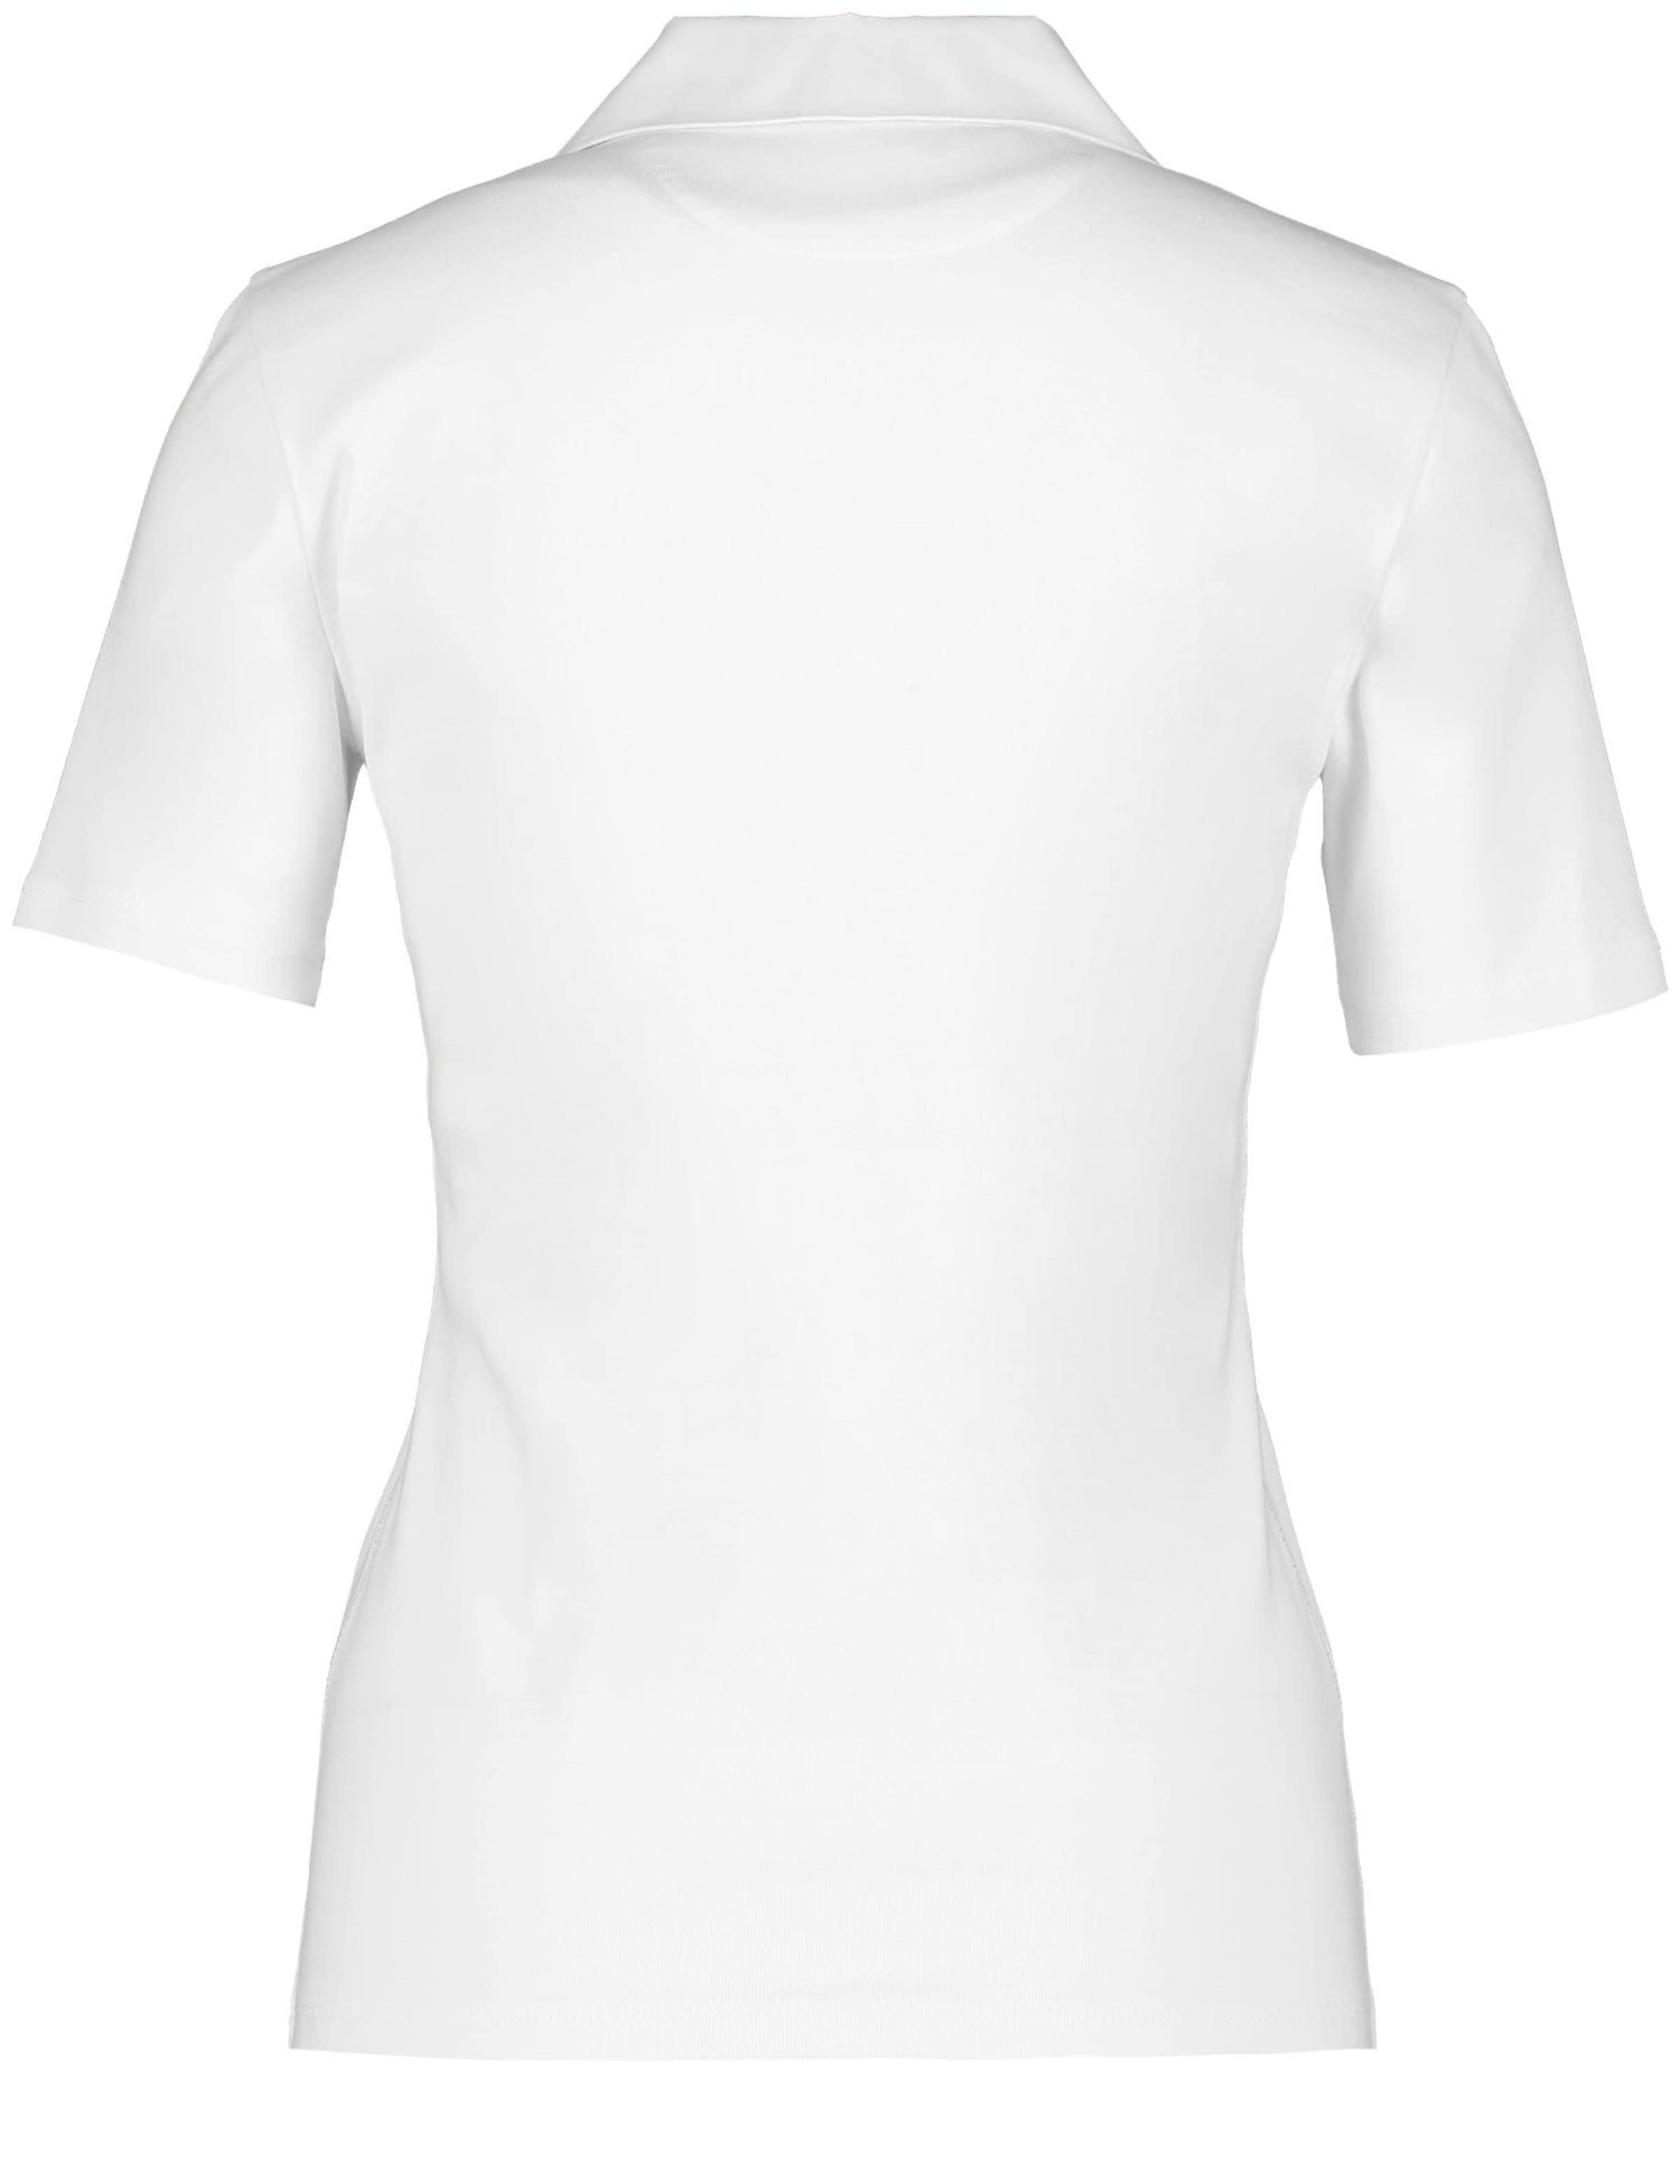 Poloshirt In Gerry Weber Weiß n0vwm8N